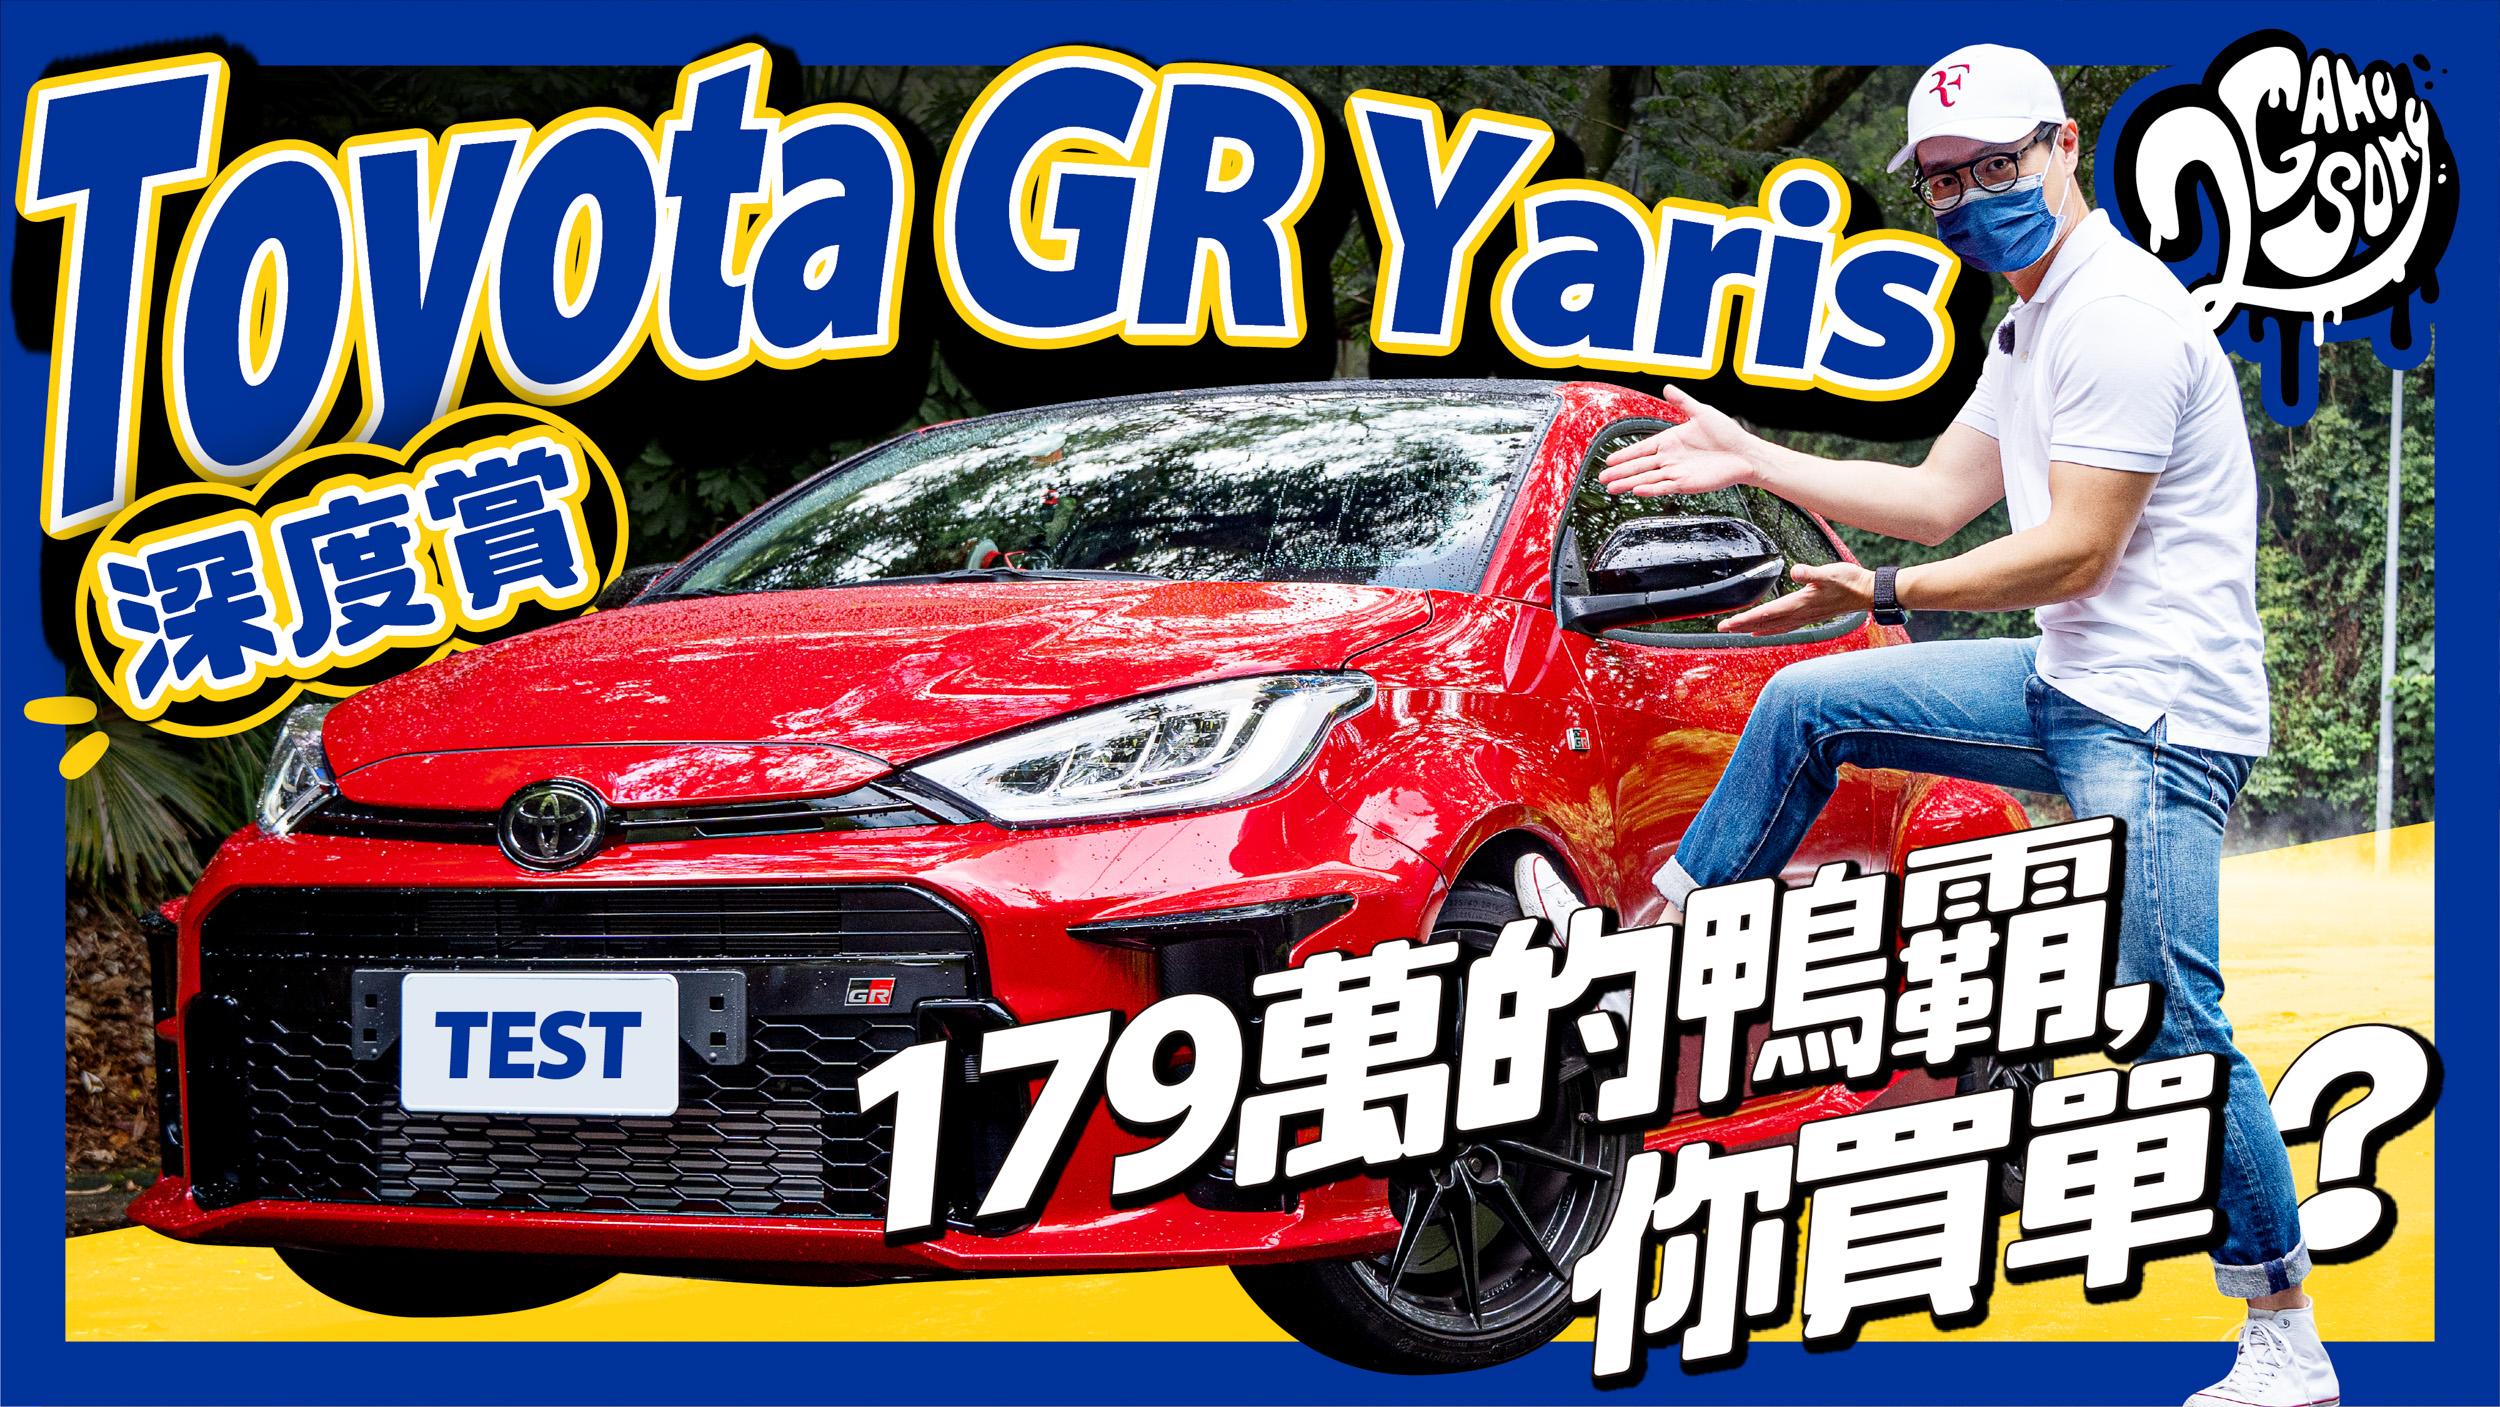 Toyota GR Yaris 深度賞|179 萬的鴨霸,你買單嗎?